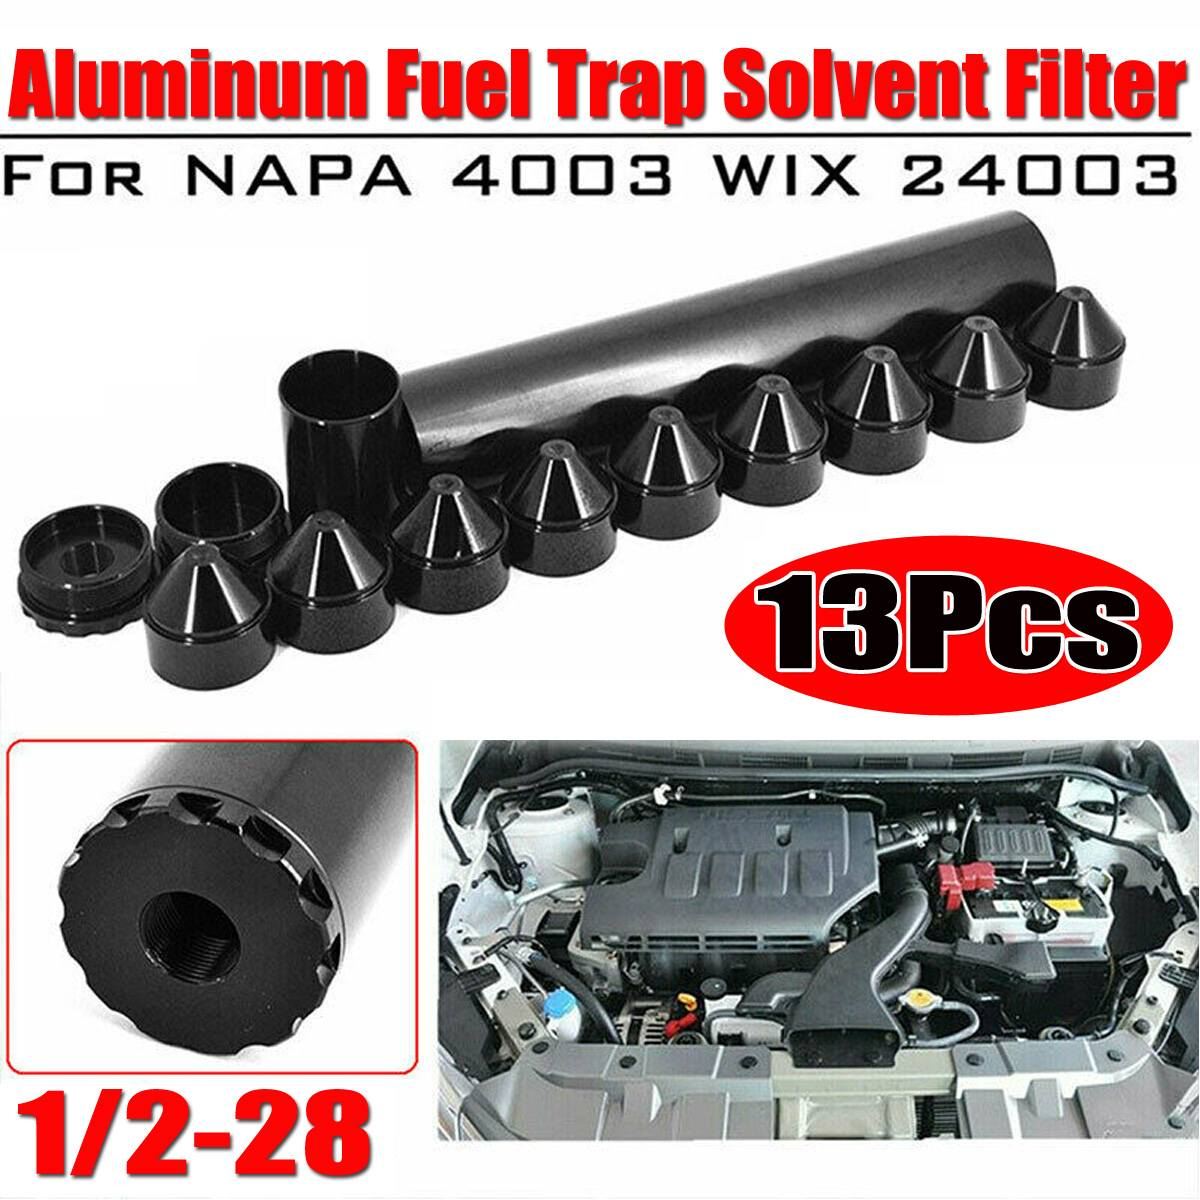 1-3/4x10 Para Napa-4003-WIX-24003 Filtro de Combustível Do Carro Para Napa 4003/WIX 24003 1/2